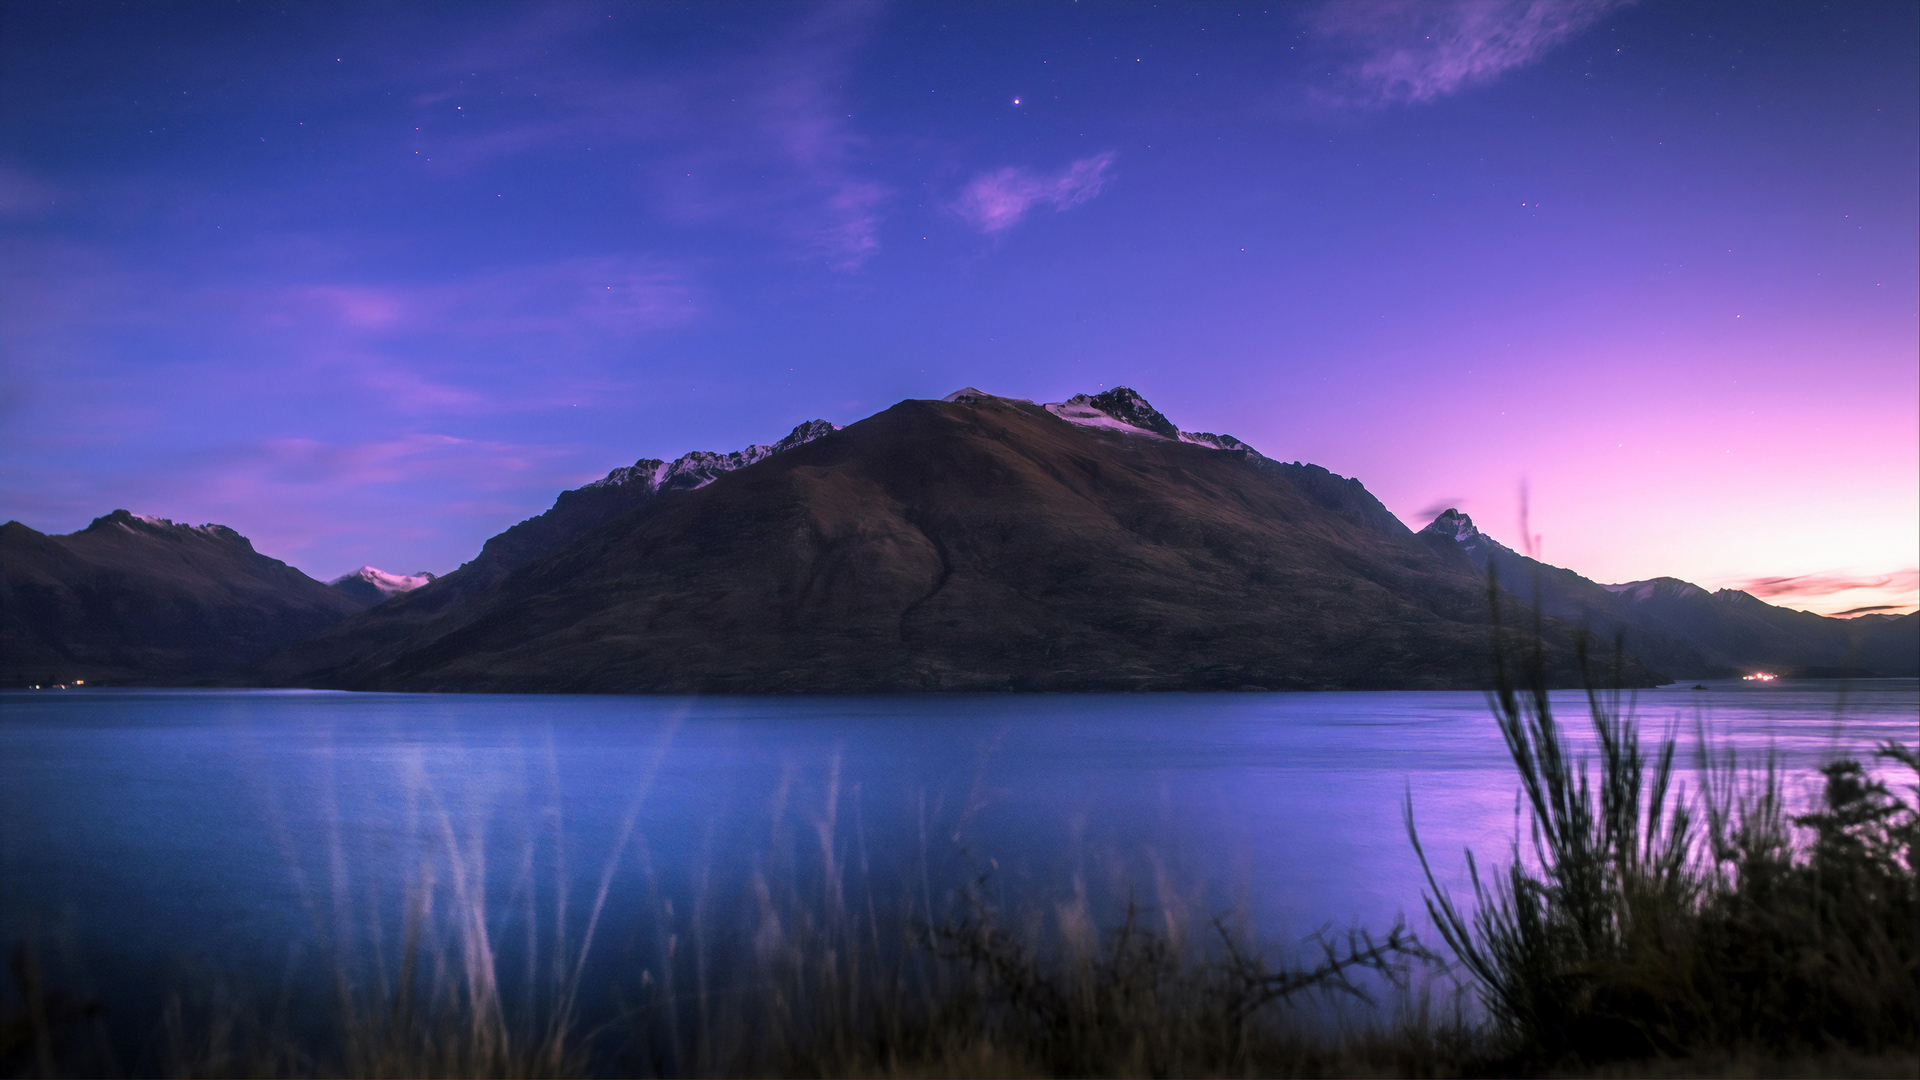 1920x1080 Lake Wakatipu In Newzealand Laptop Full HD 1080P ...